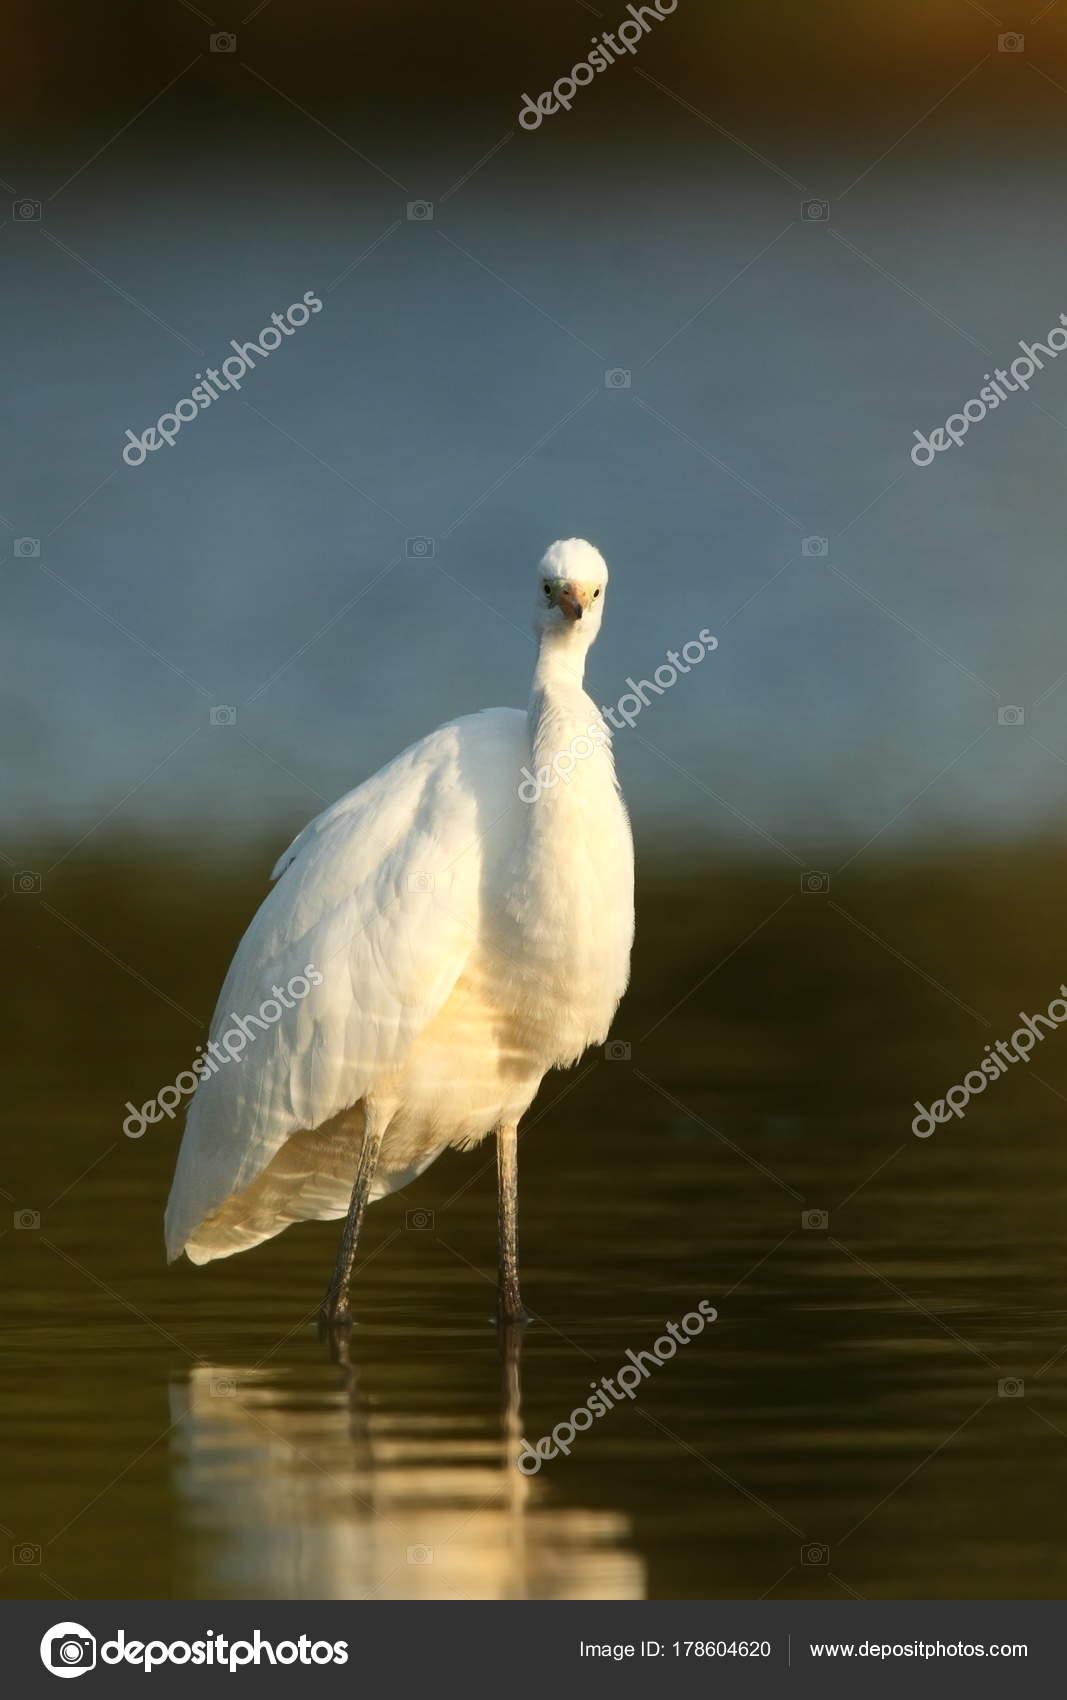 gay πορνό μεγάλο λευκό πουλί